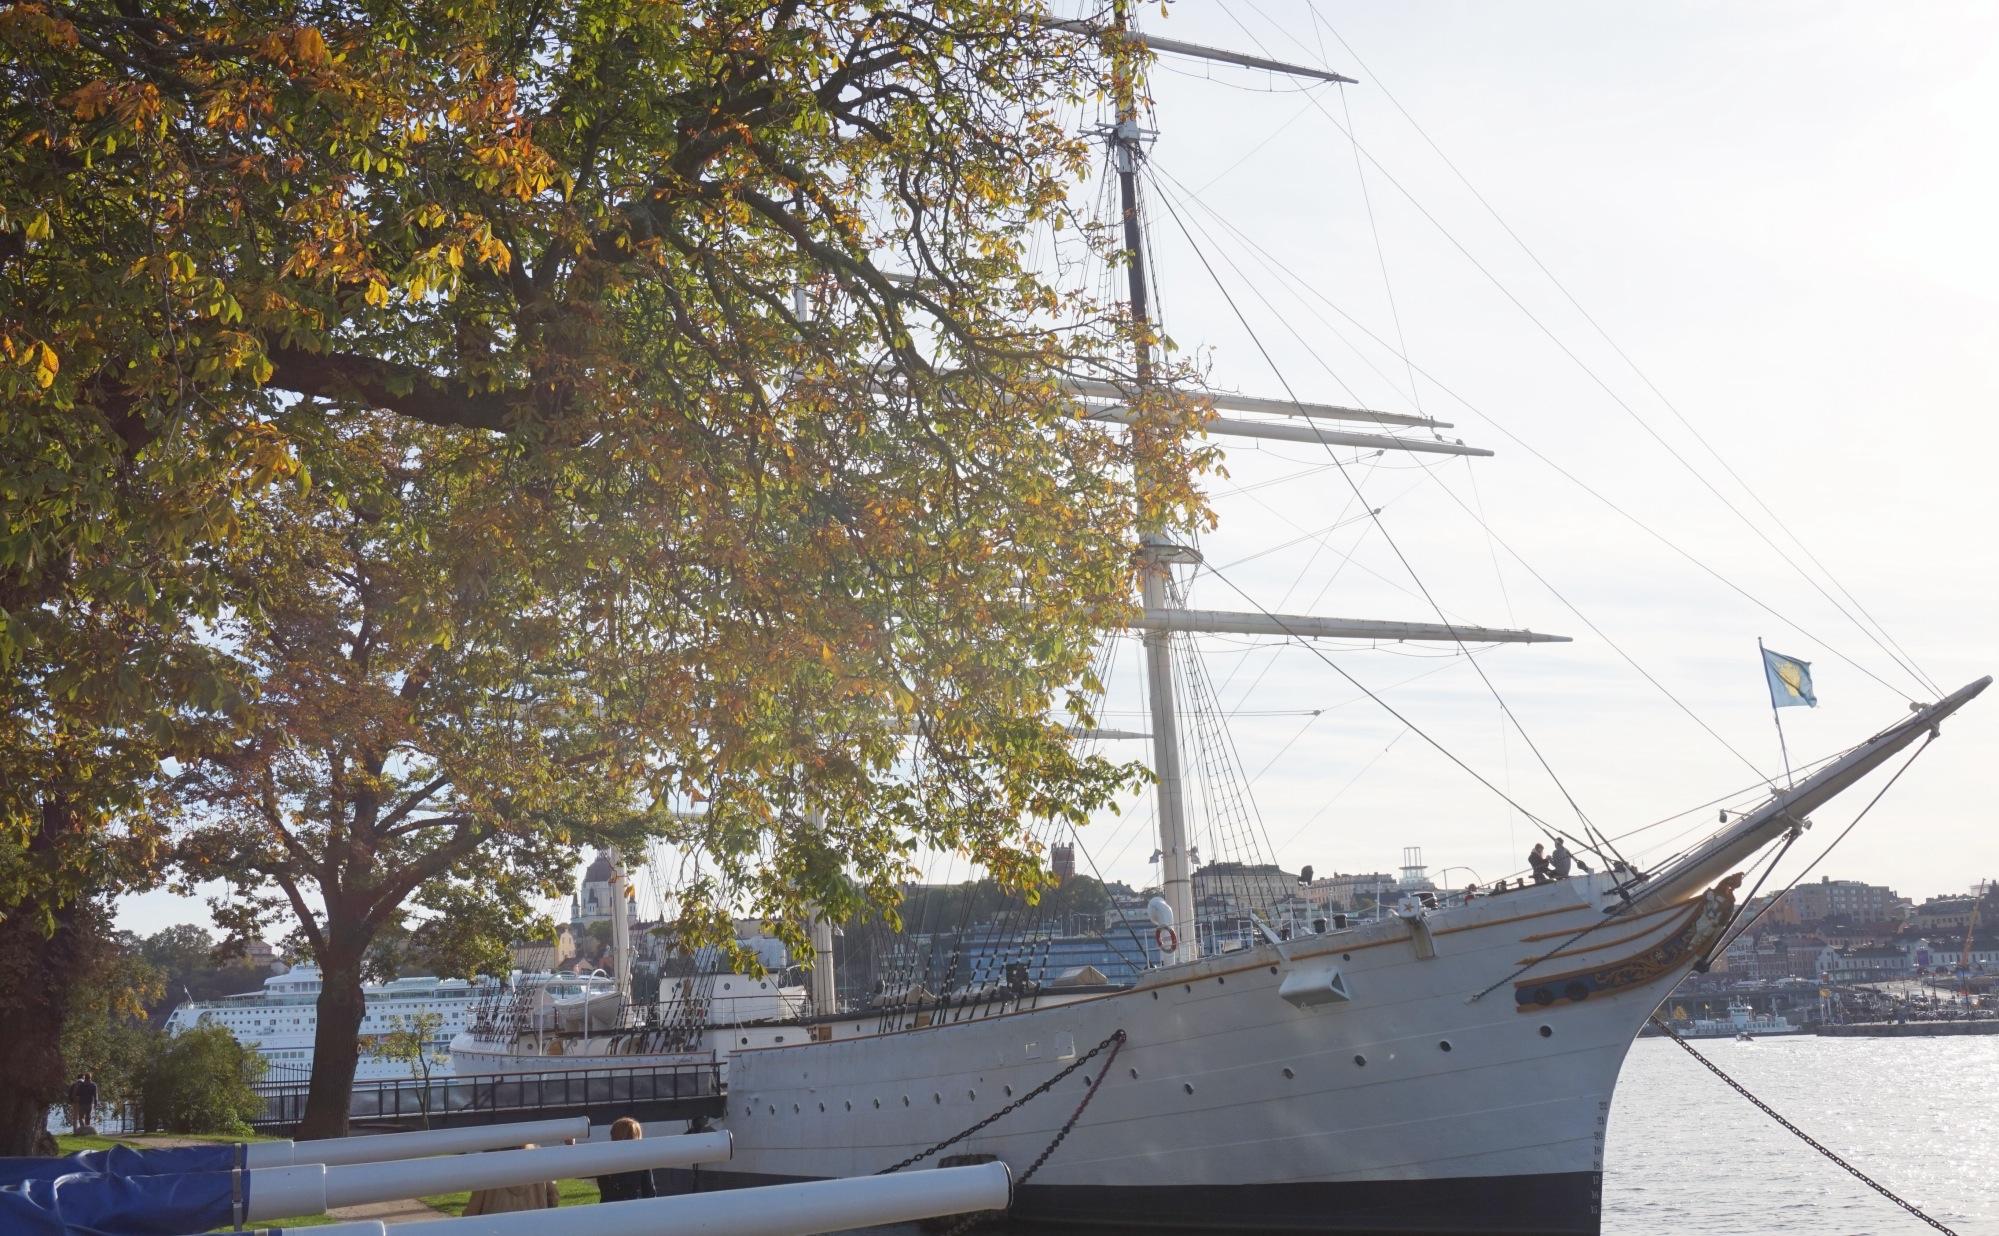 3-jours-a-stockholm-50